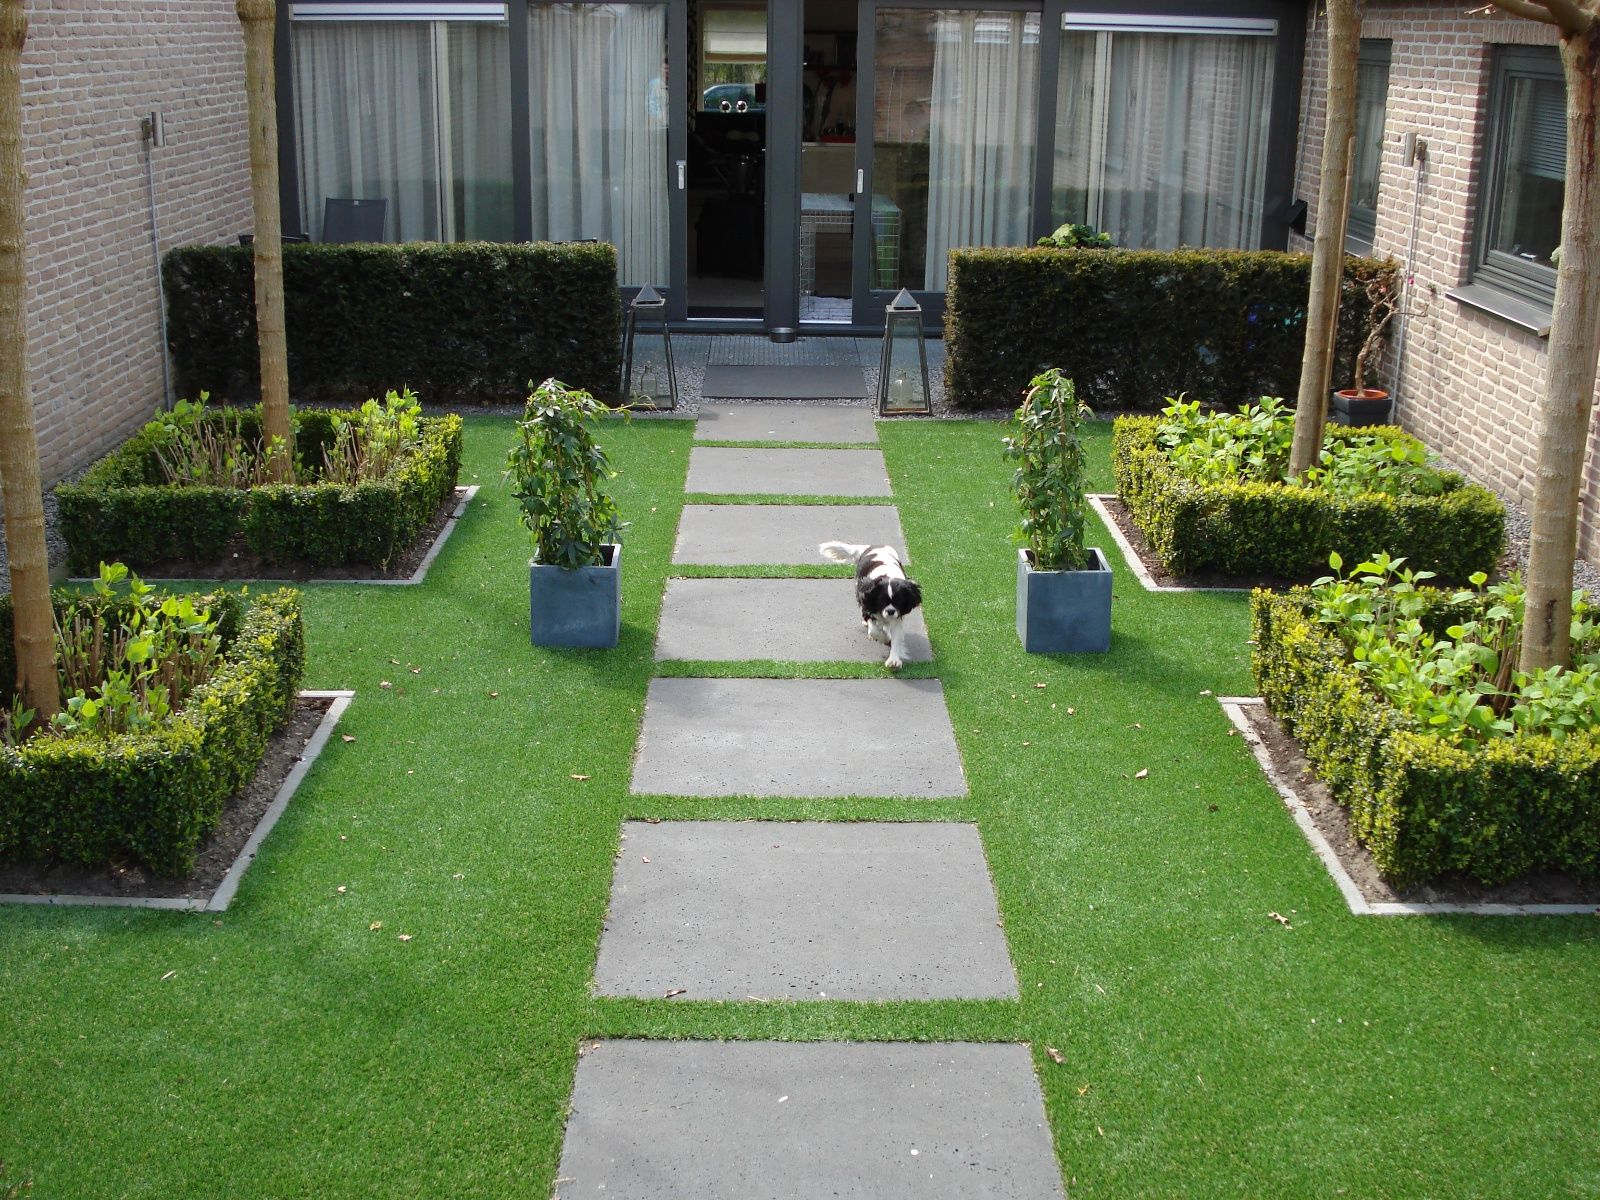 Tuin En Kunstgras : Tuin kunstgras google zoeken tuin in garden